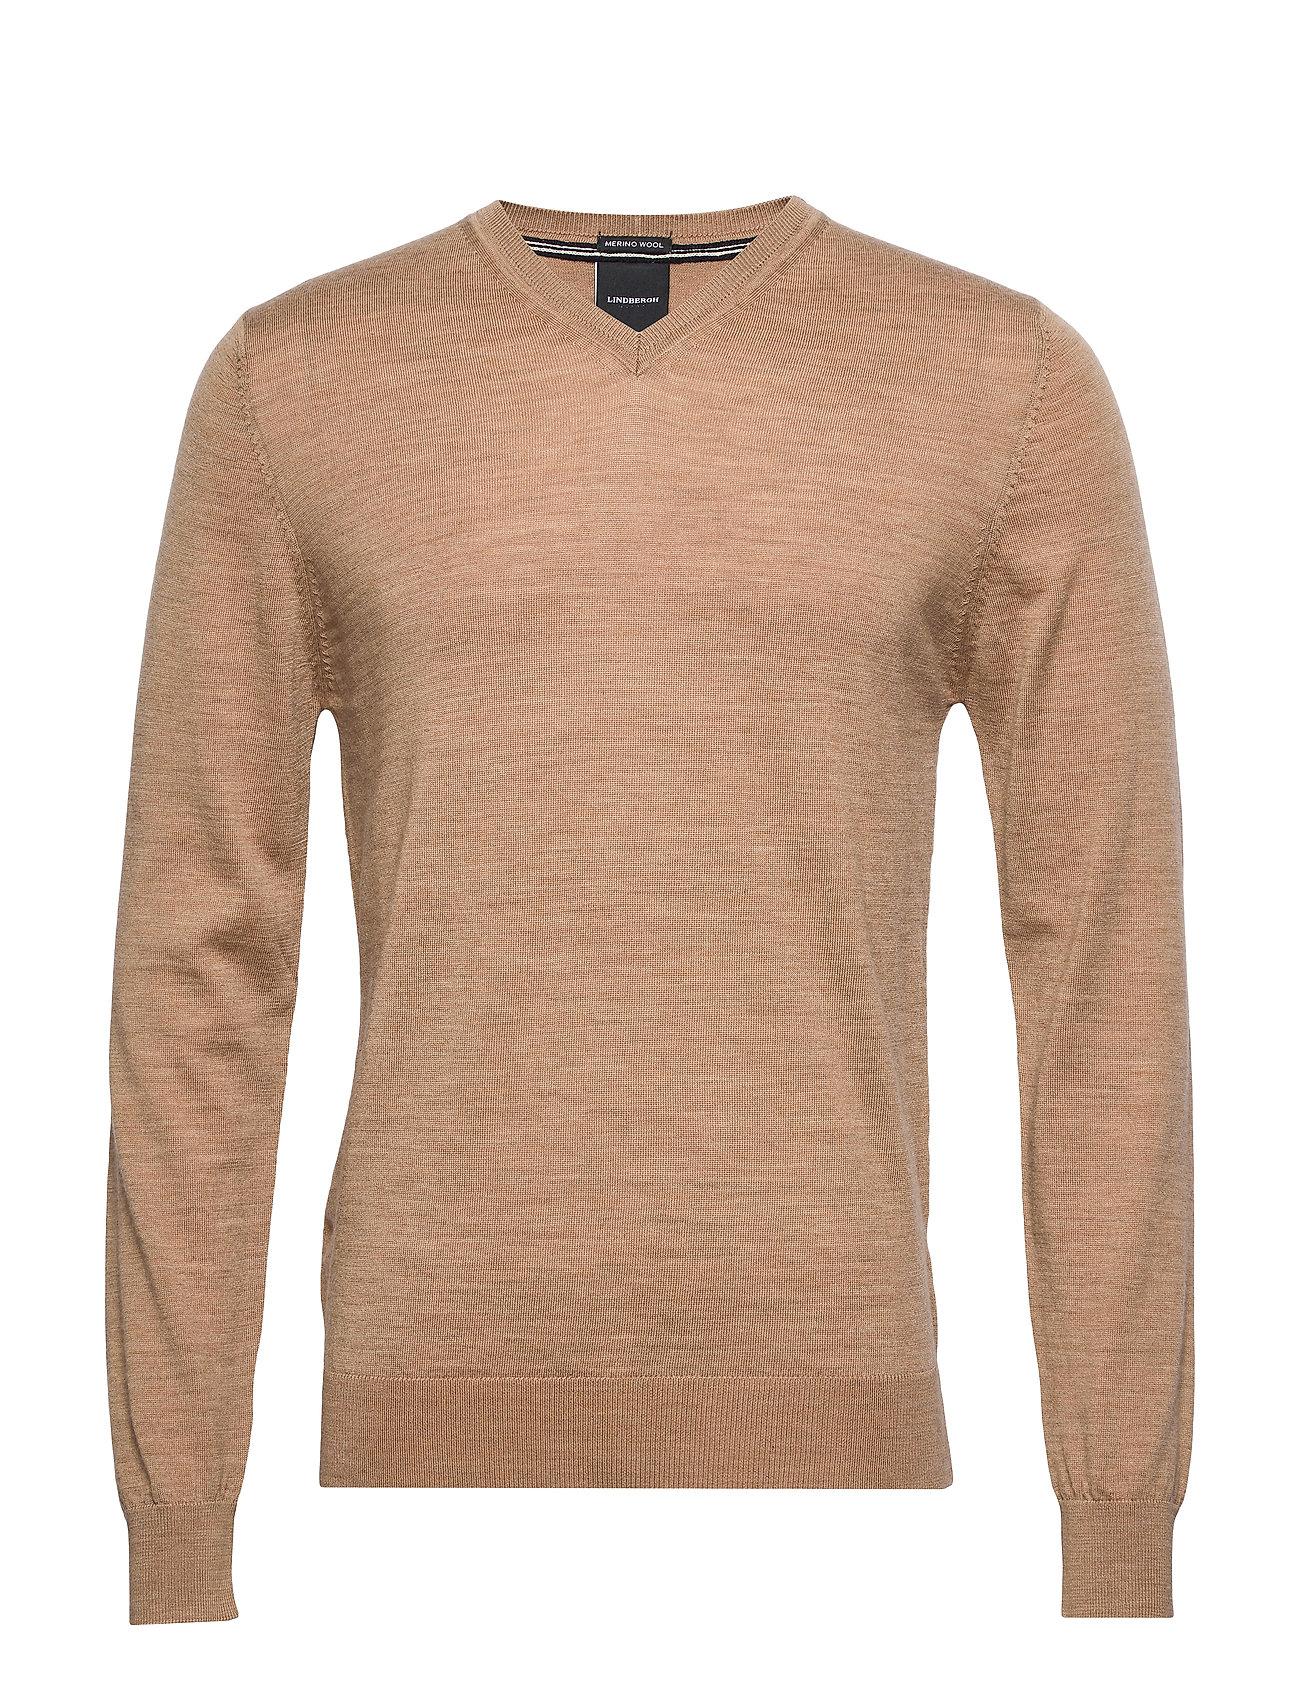 Lindbergh 100 % merino v-neck knit - LT CAMEL MEL